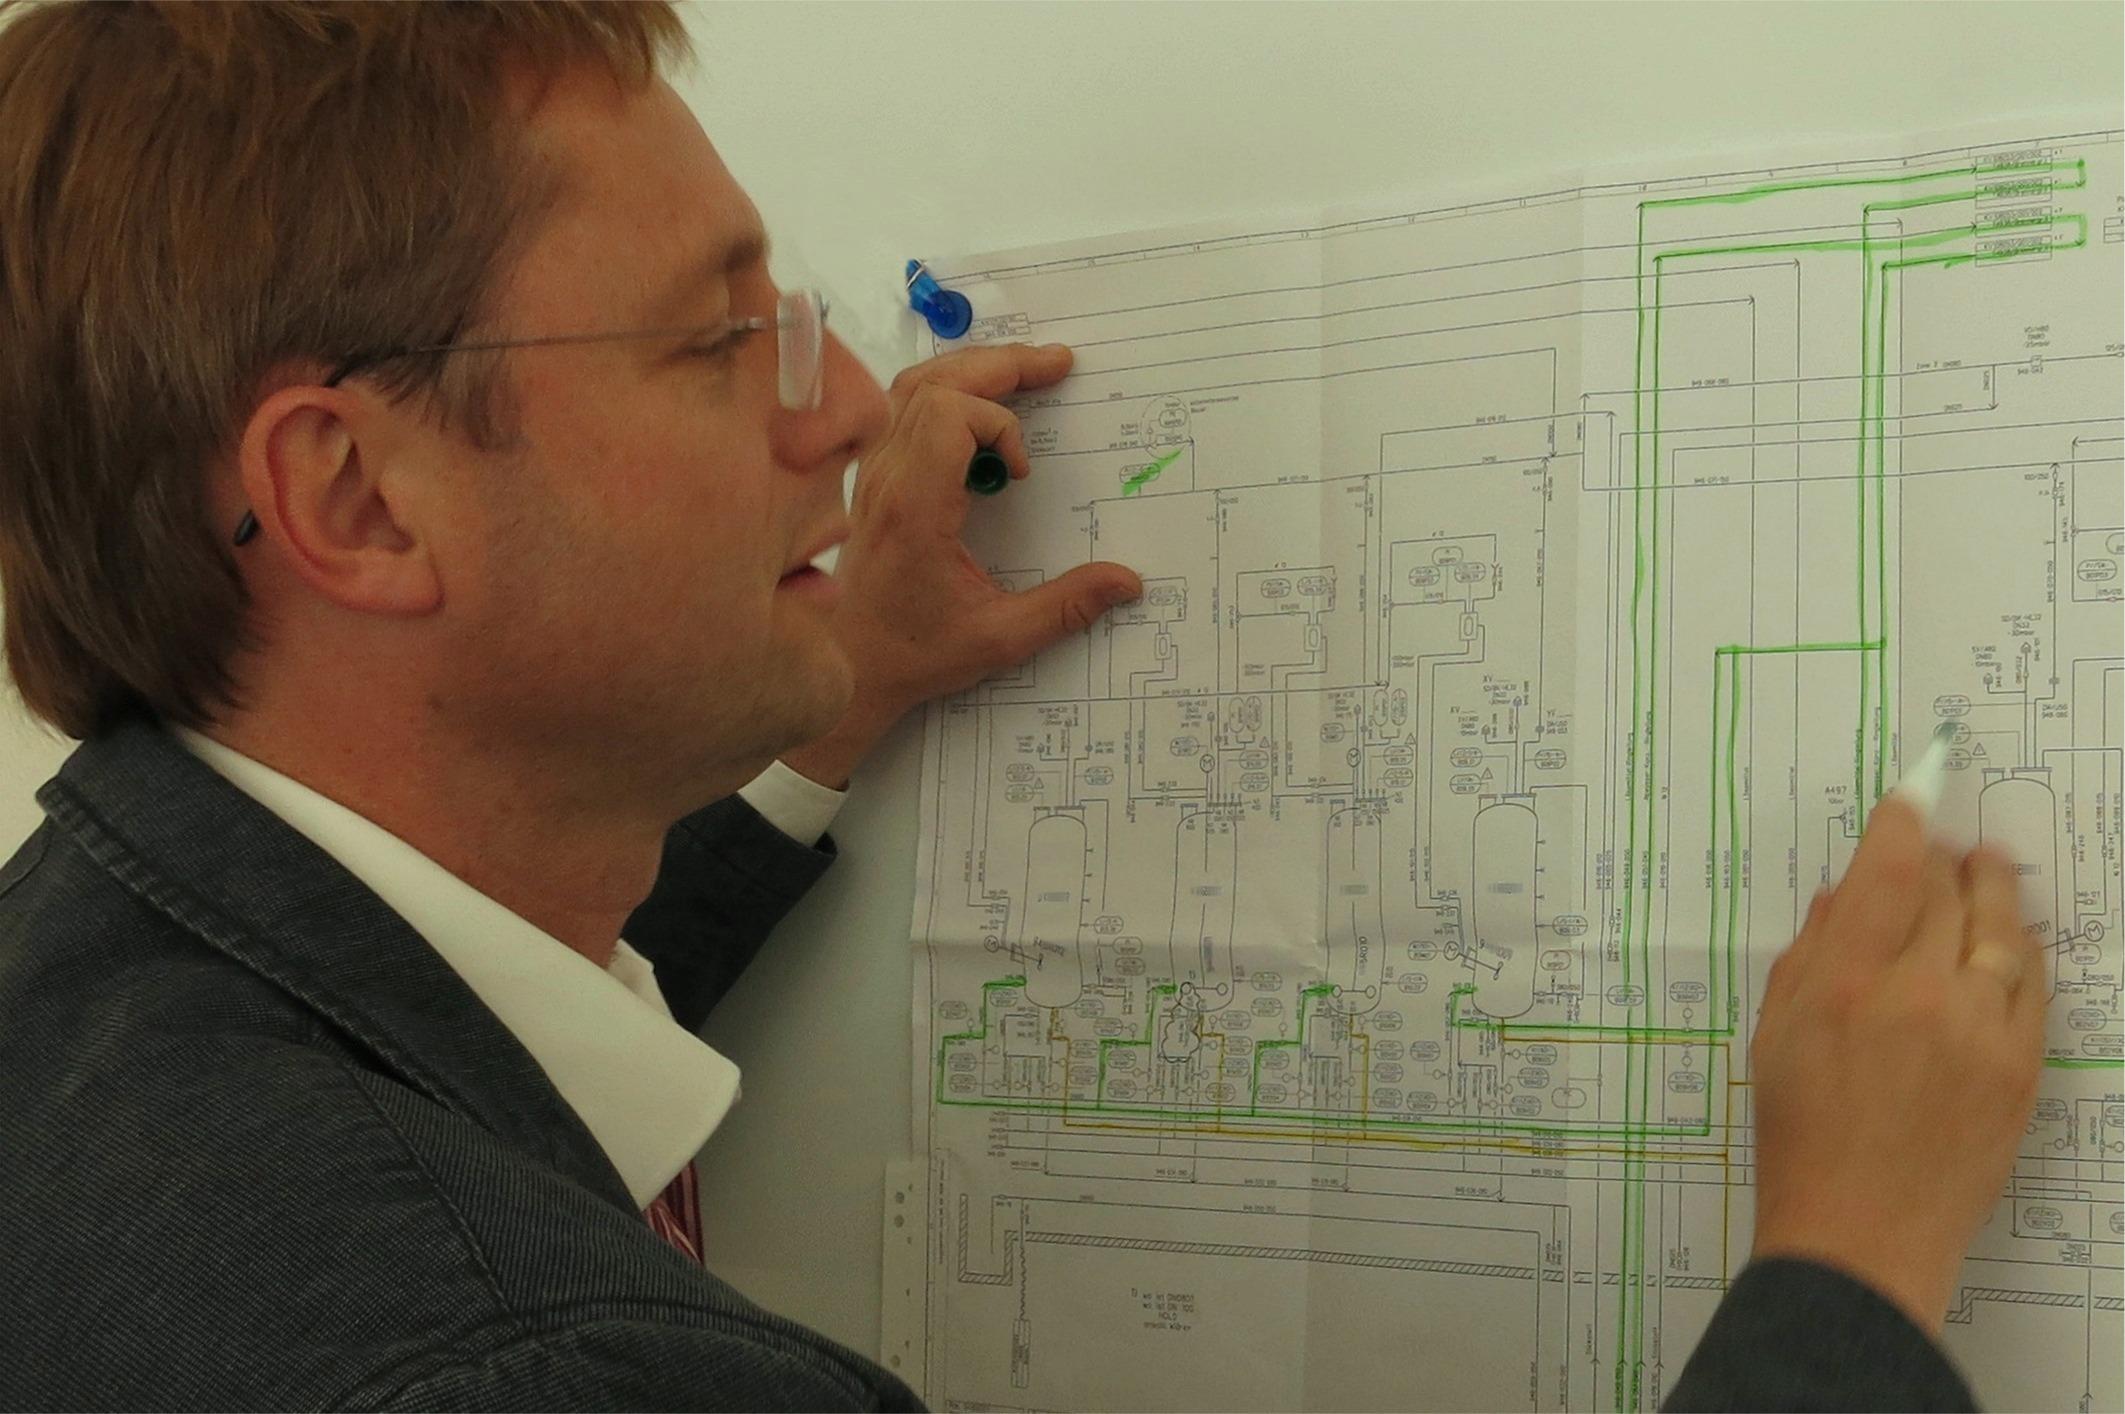 Foto: Ingenieurbüro Axel Erbe - Fließbild